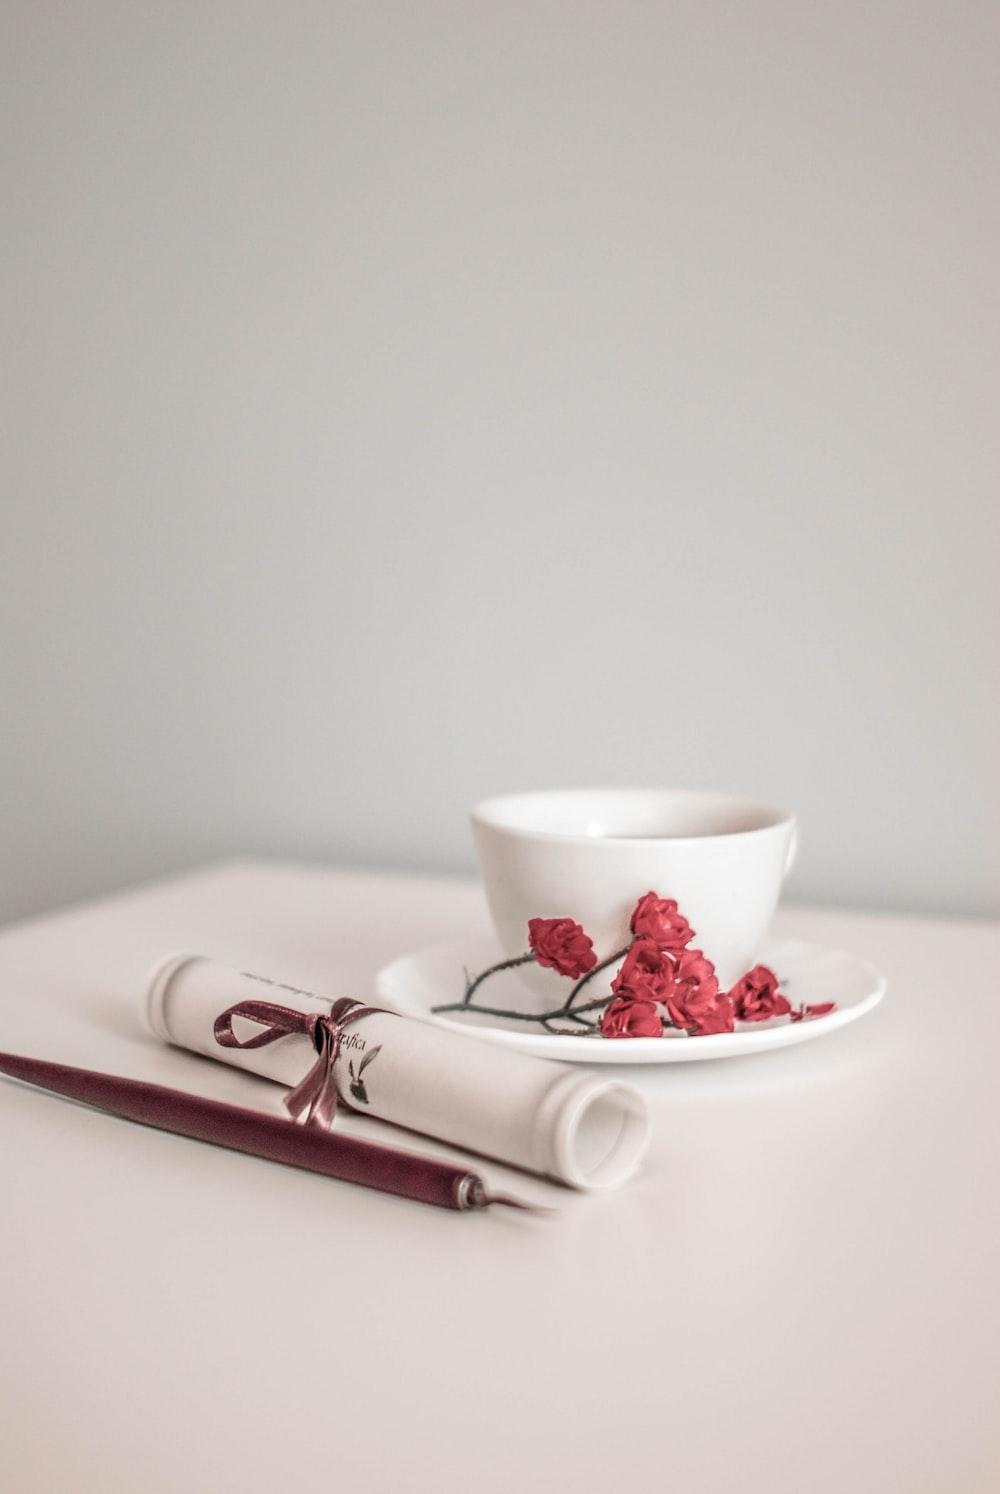 white ceramic bowl on white ceramic plate